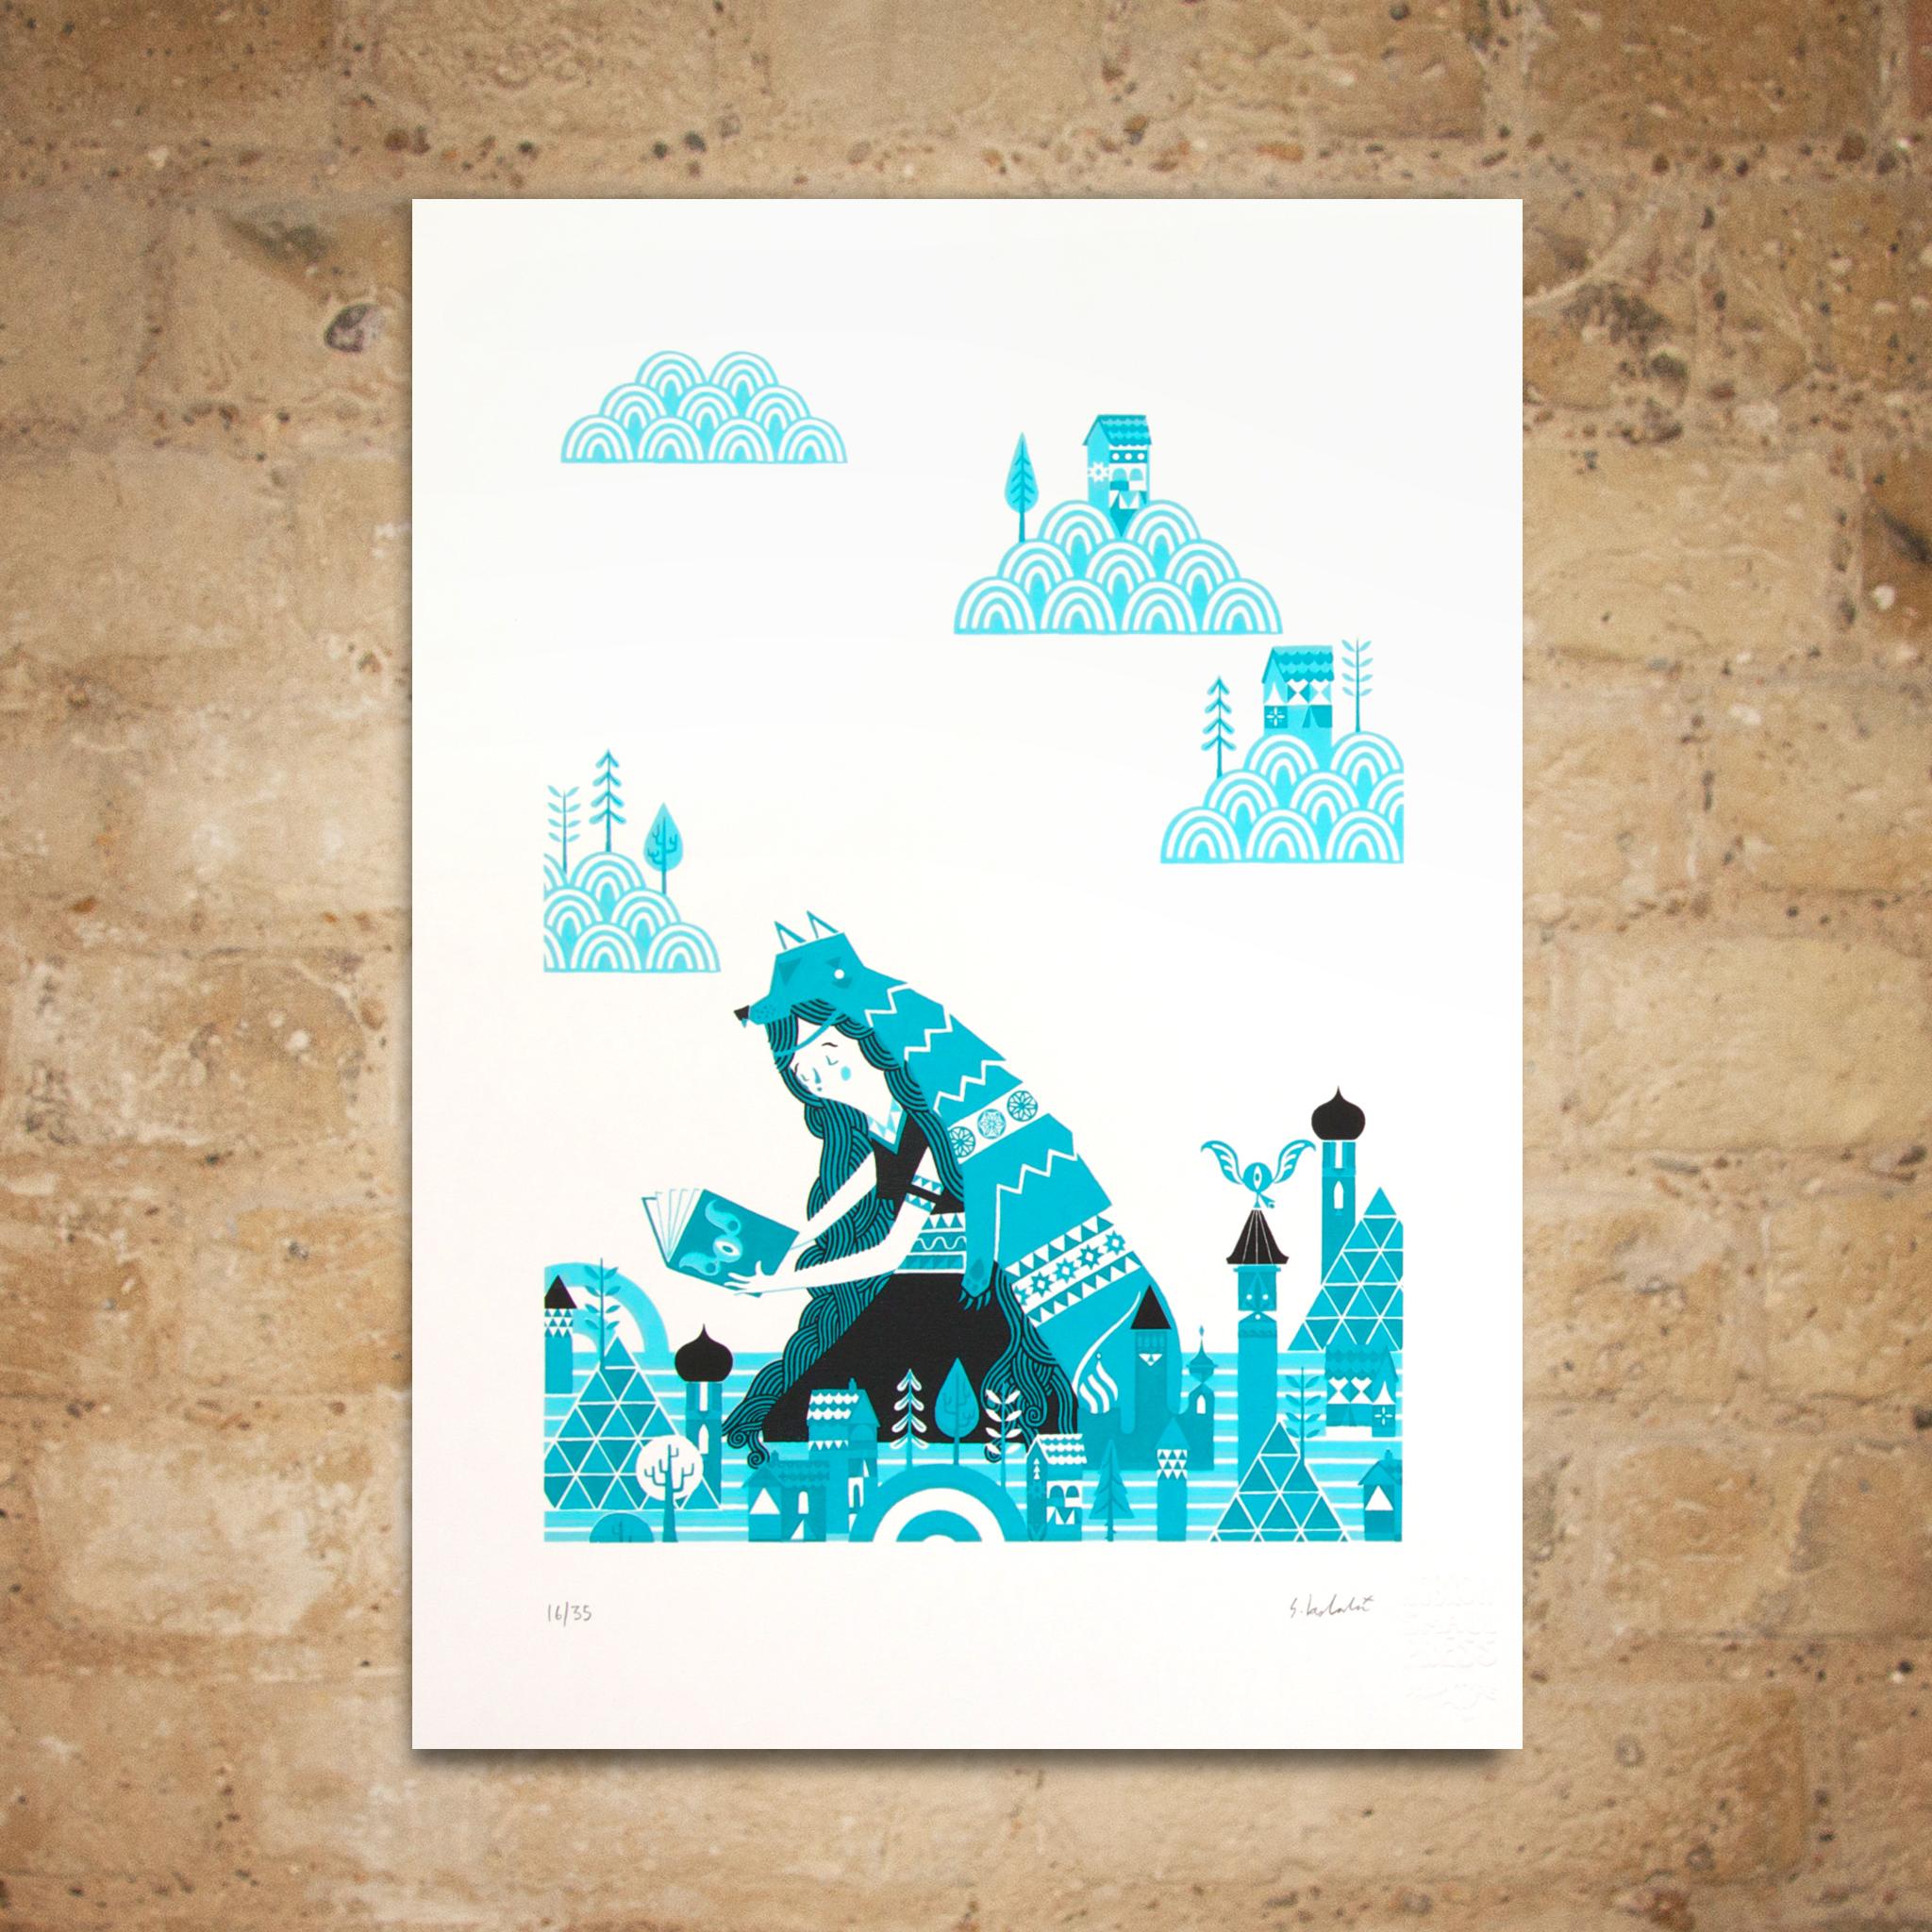 Stuart Kolakovic 'Fox' Print